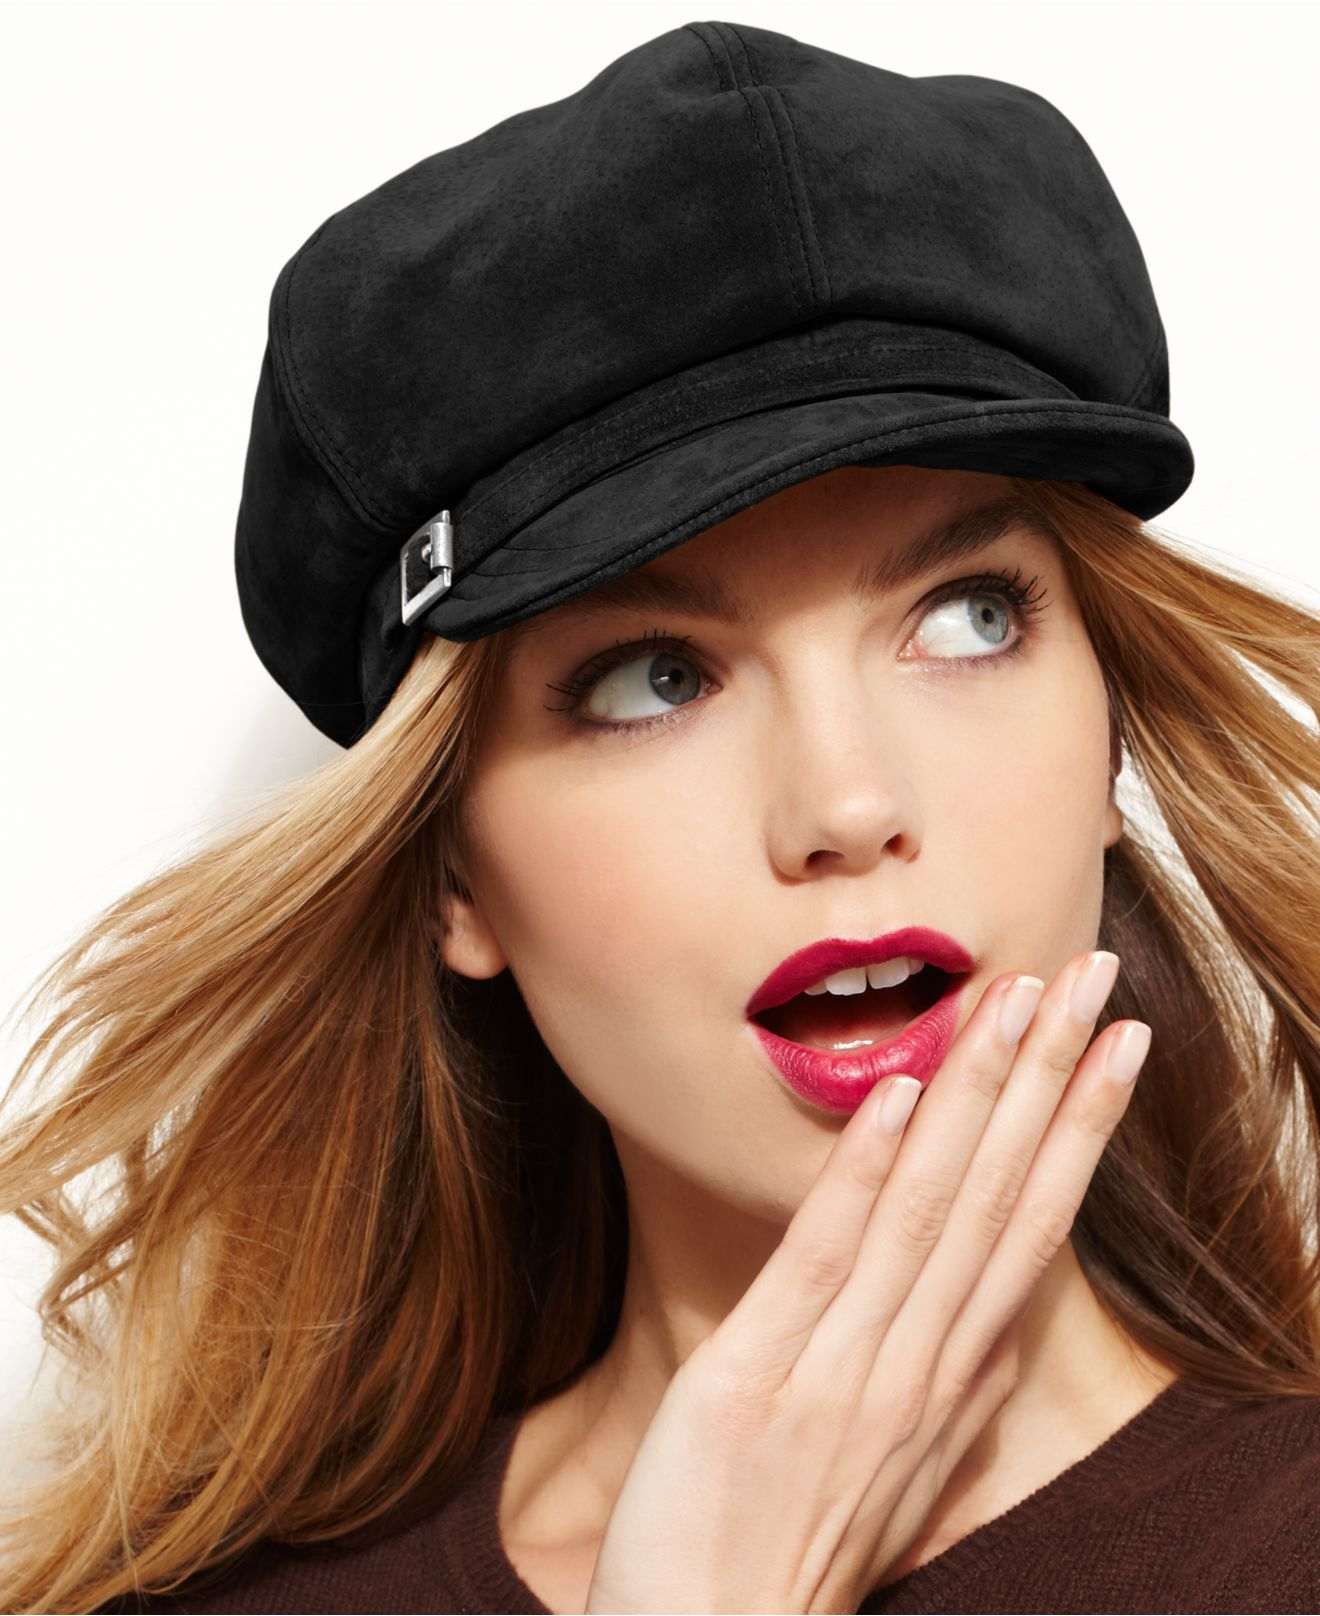 Lyst - Nine West Suede Newsboy Hat in Black a17526aee78